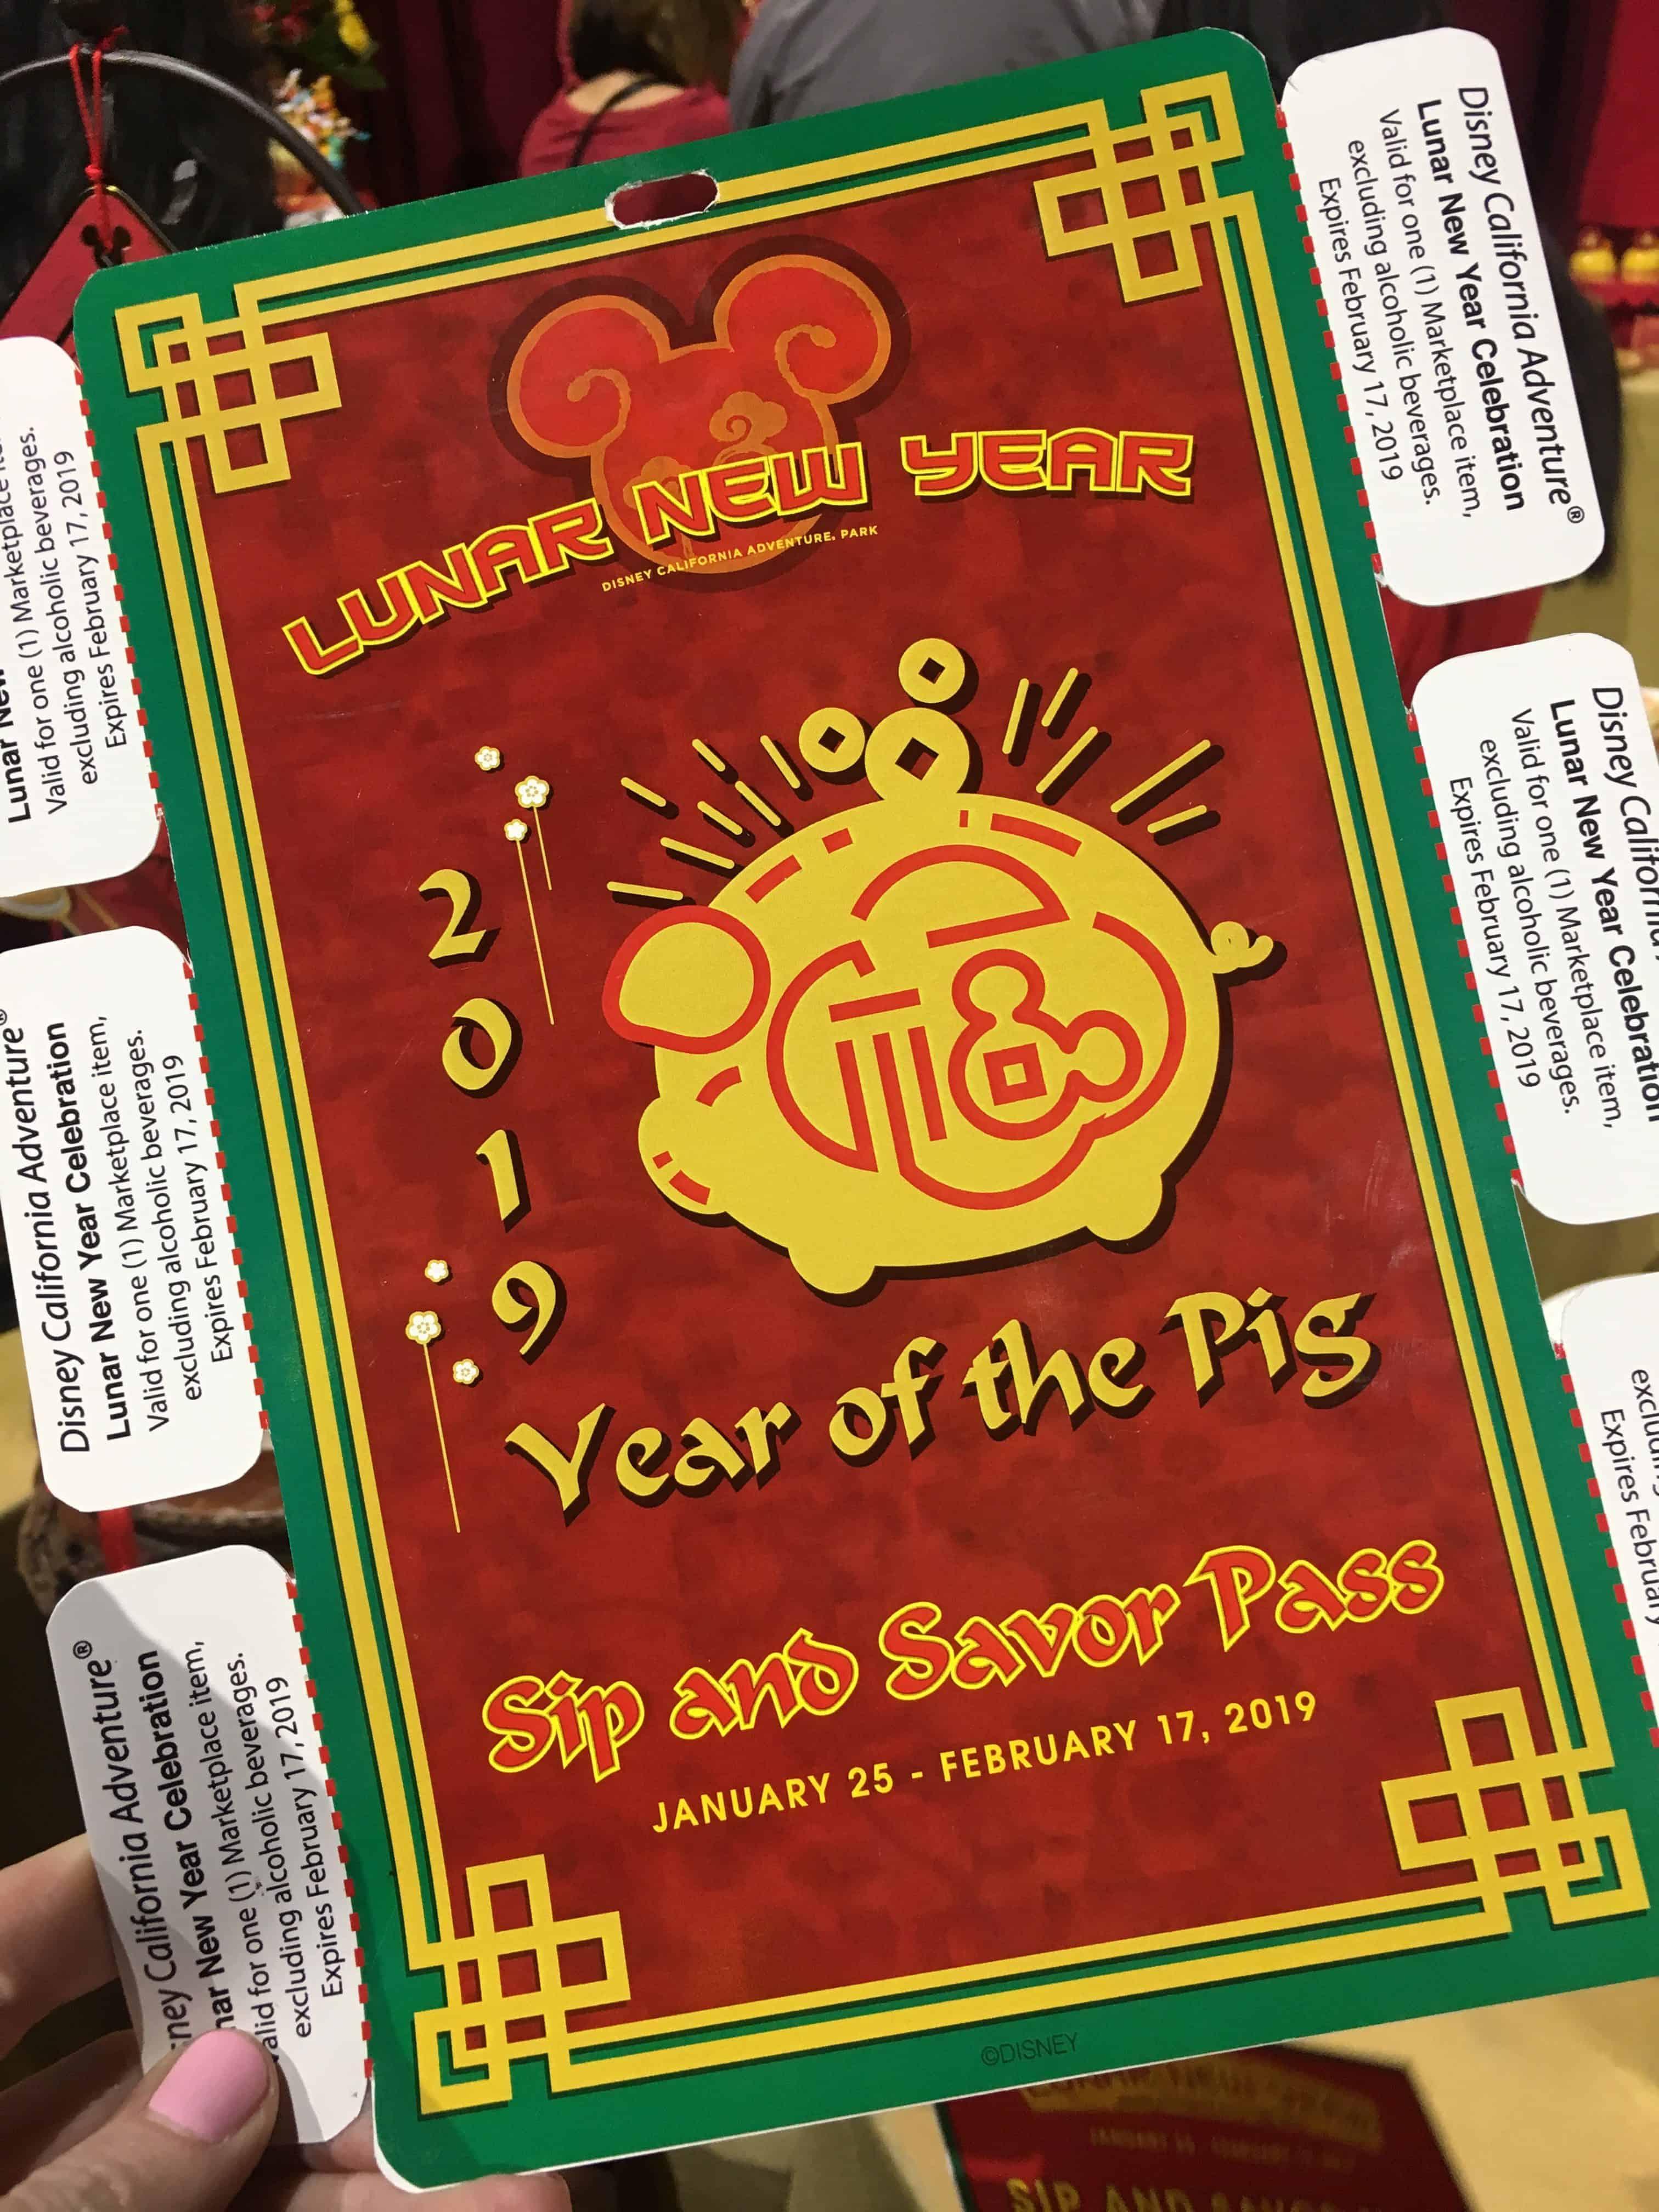 Lunar New Year Sip and Savor